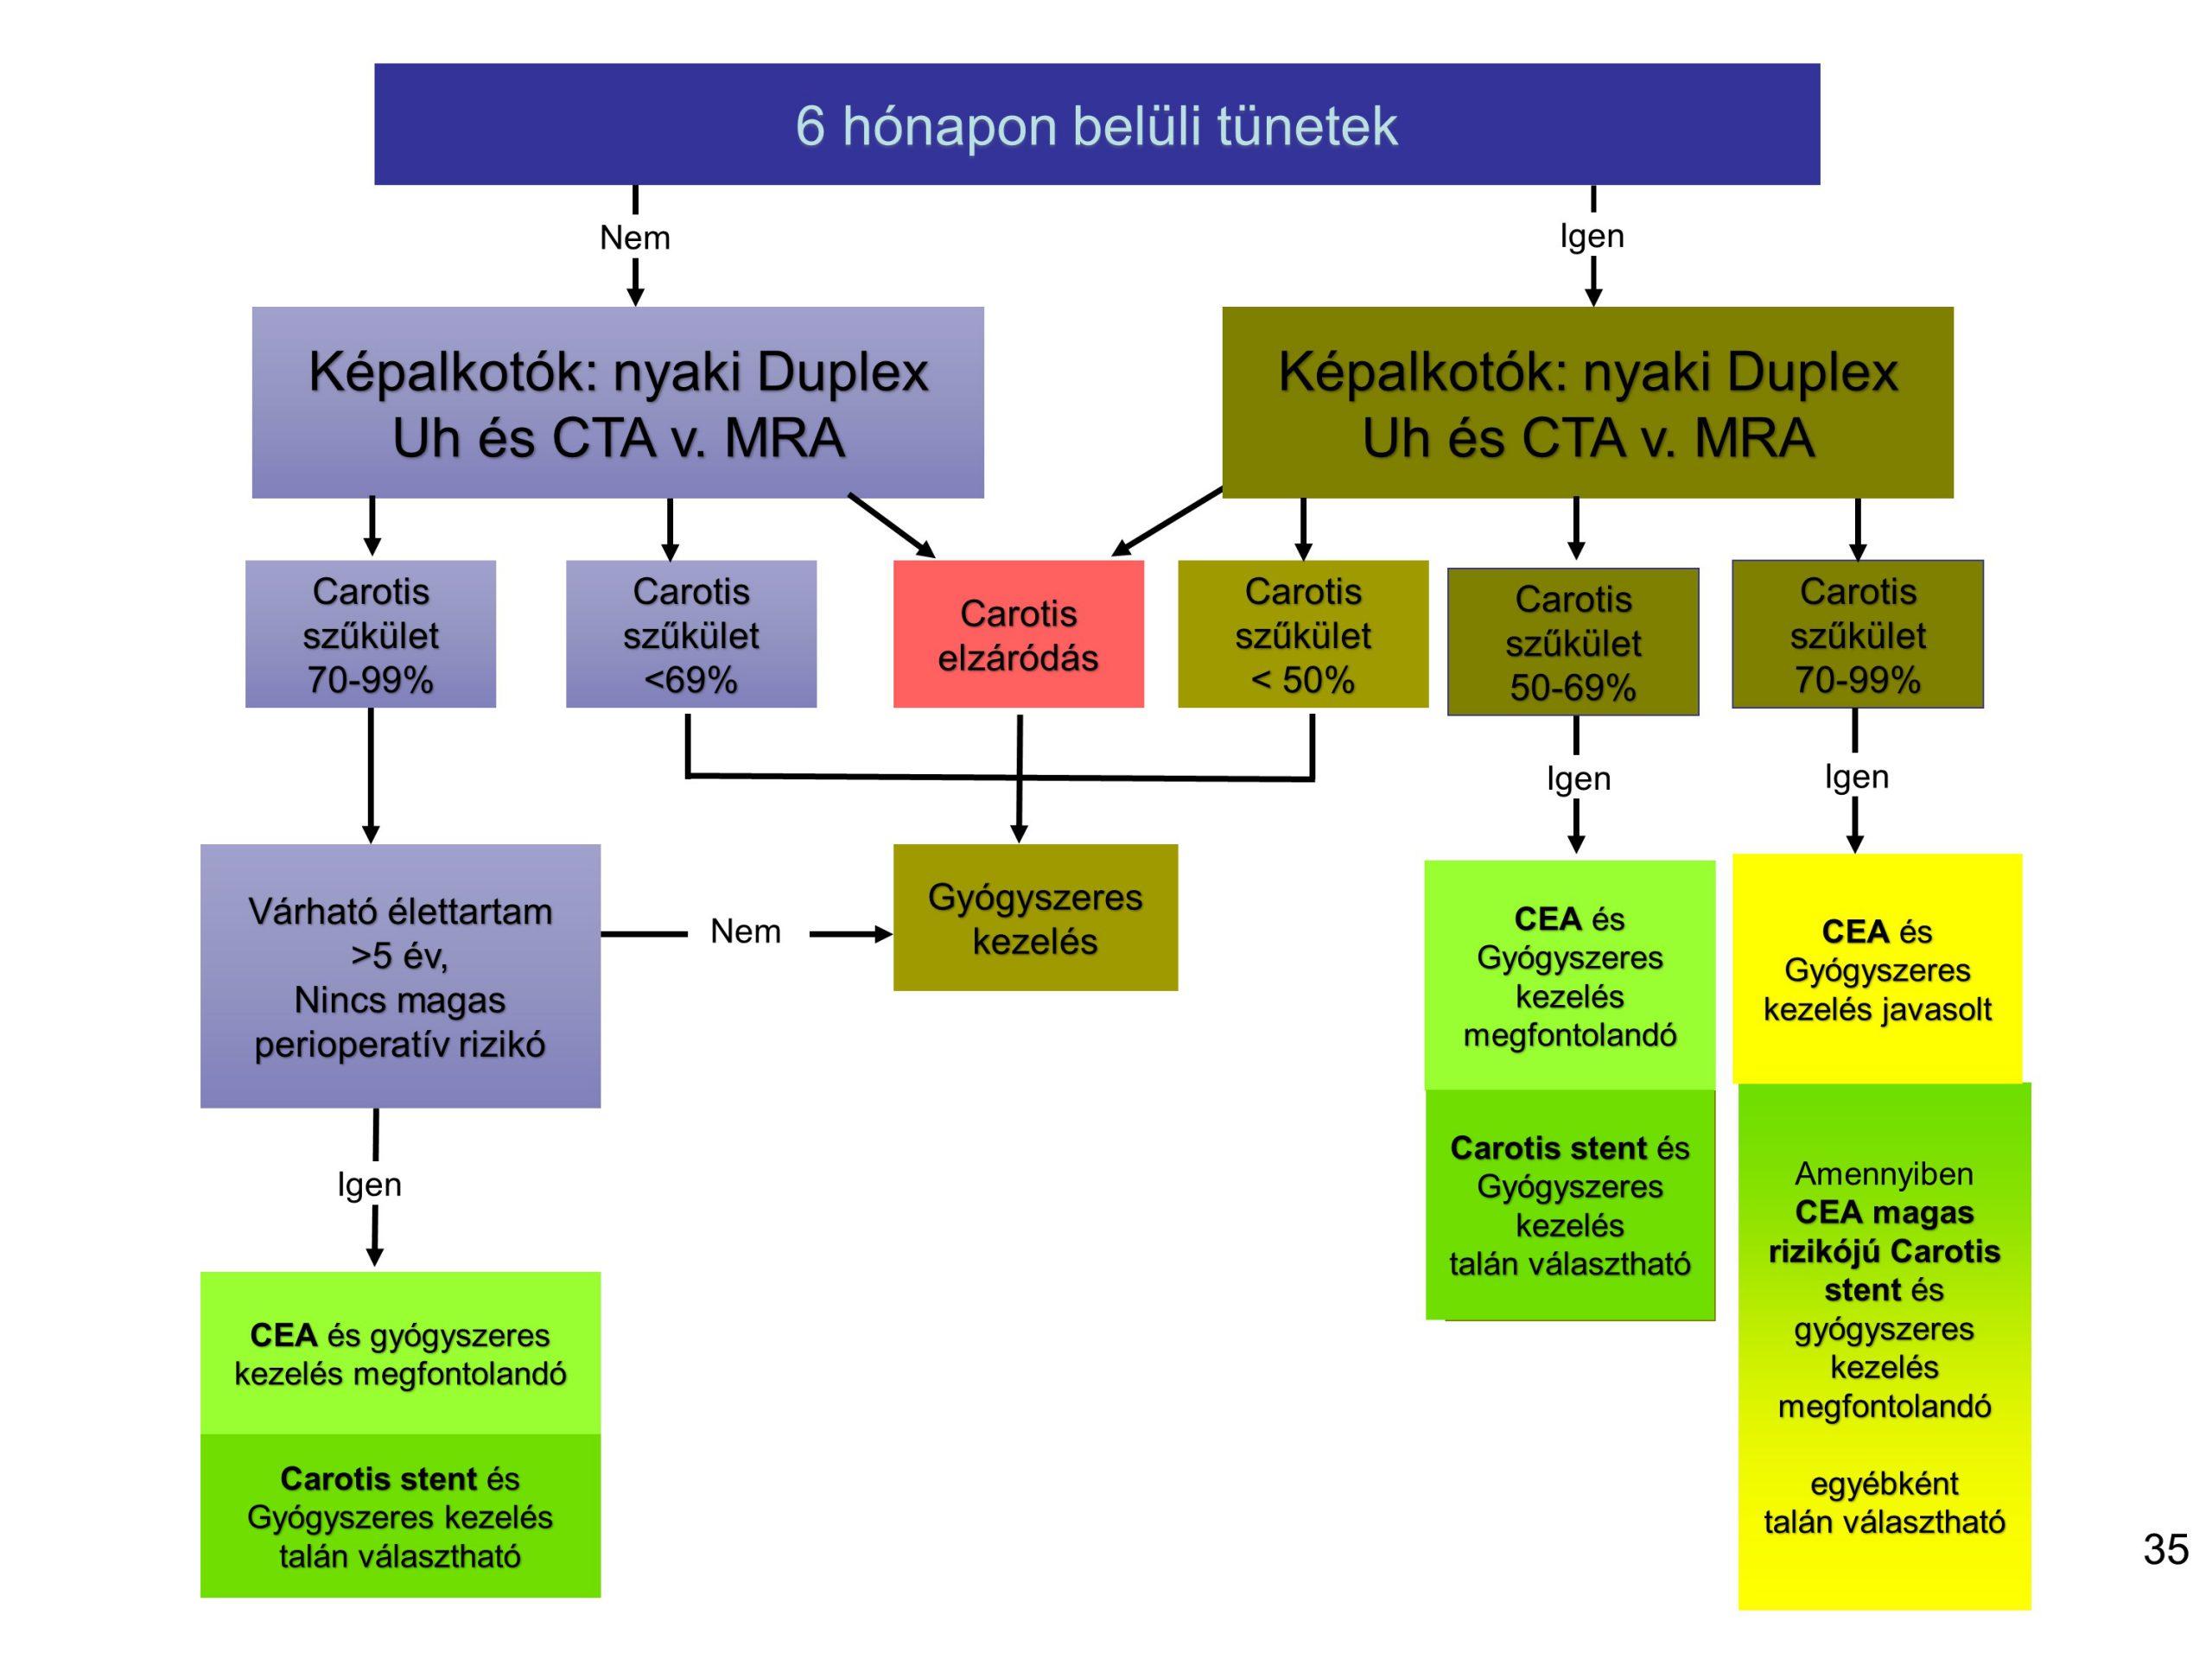 magas vérnyomás neuropatológus